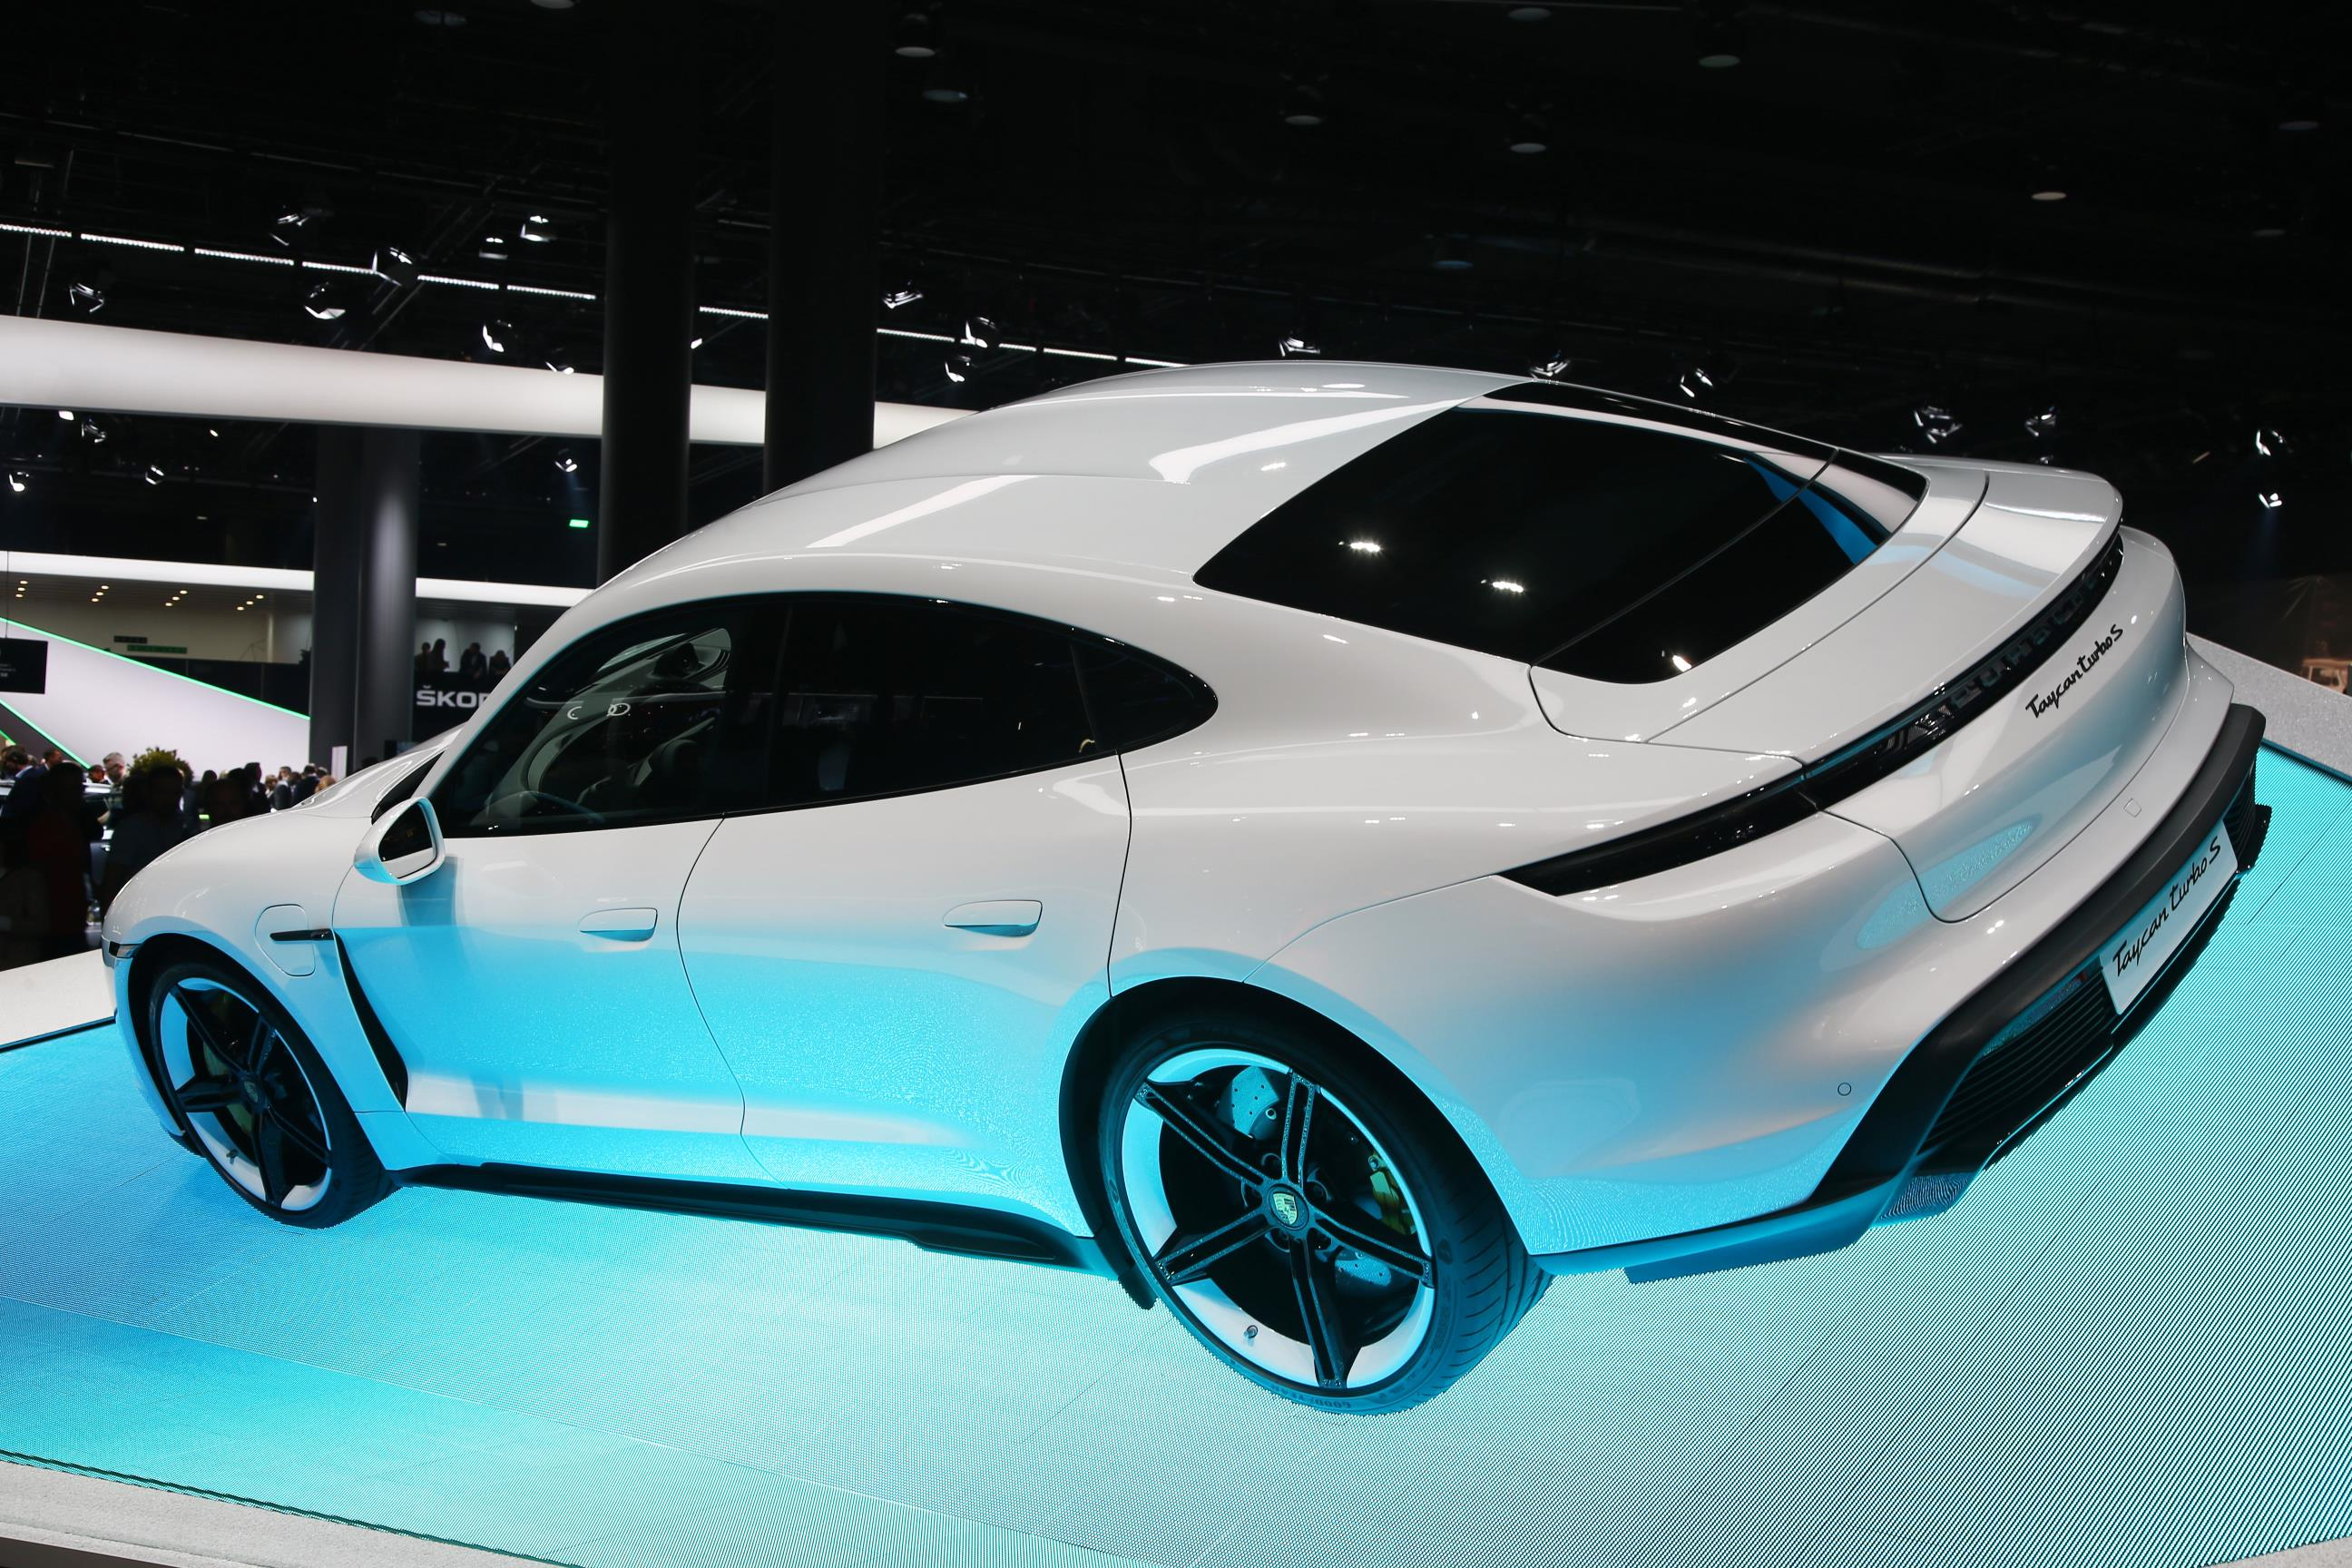 White Porsche Taycan Turbo S